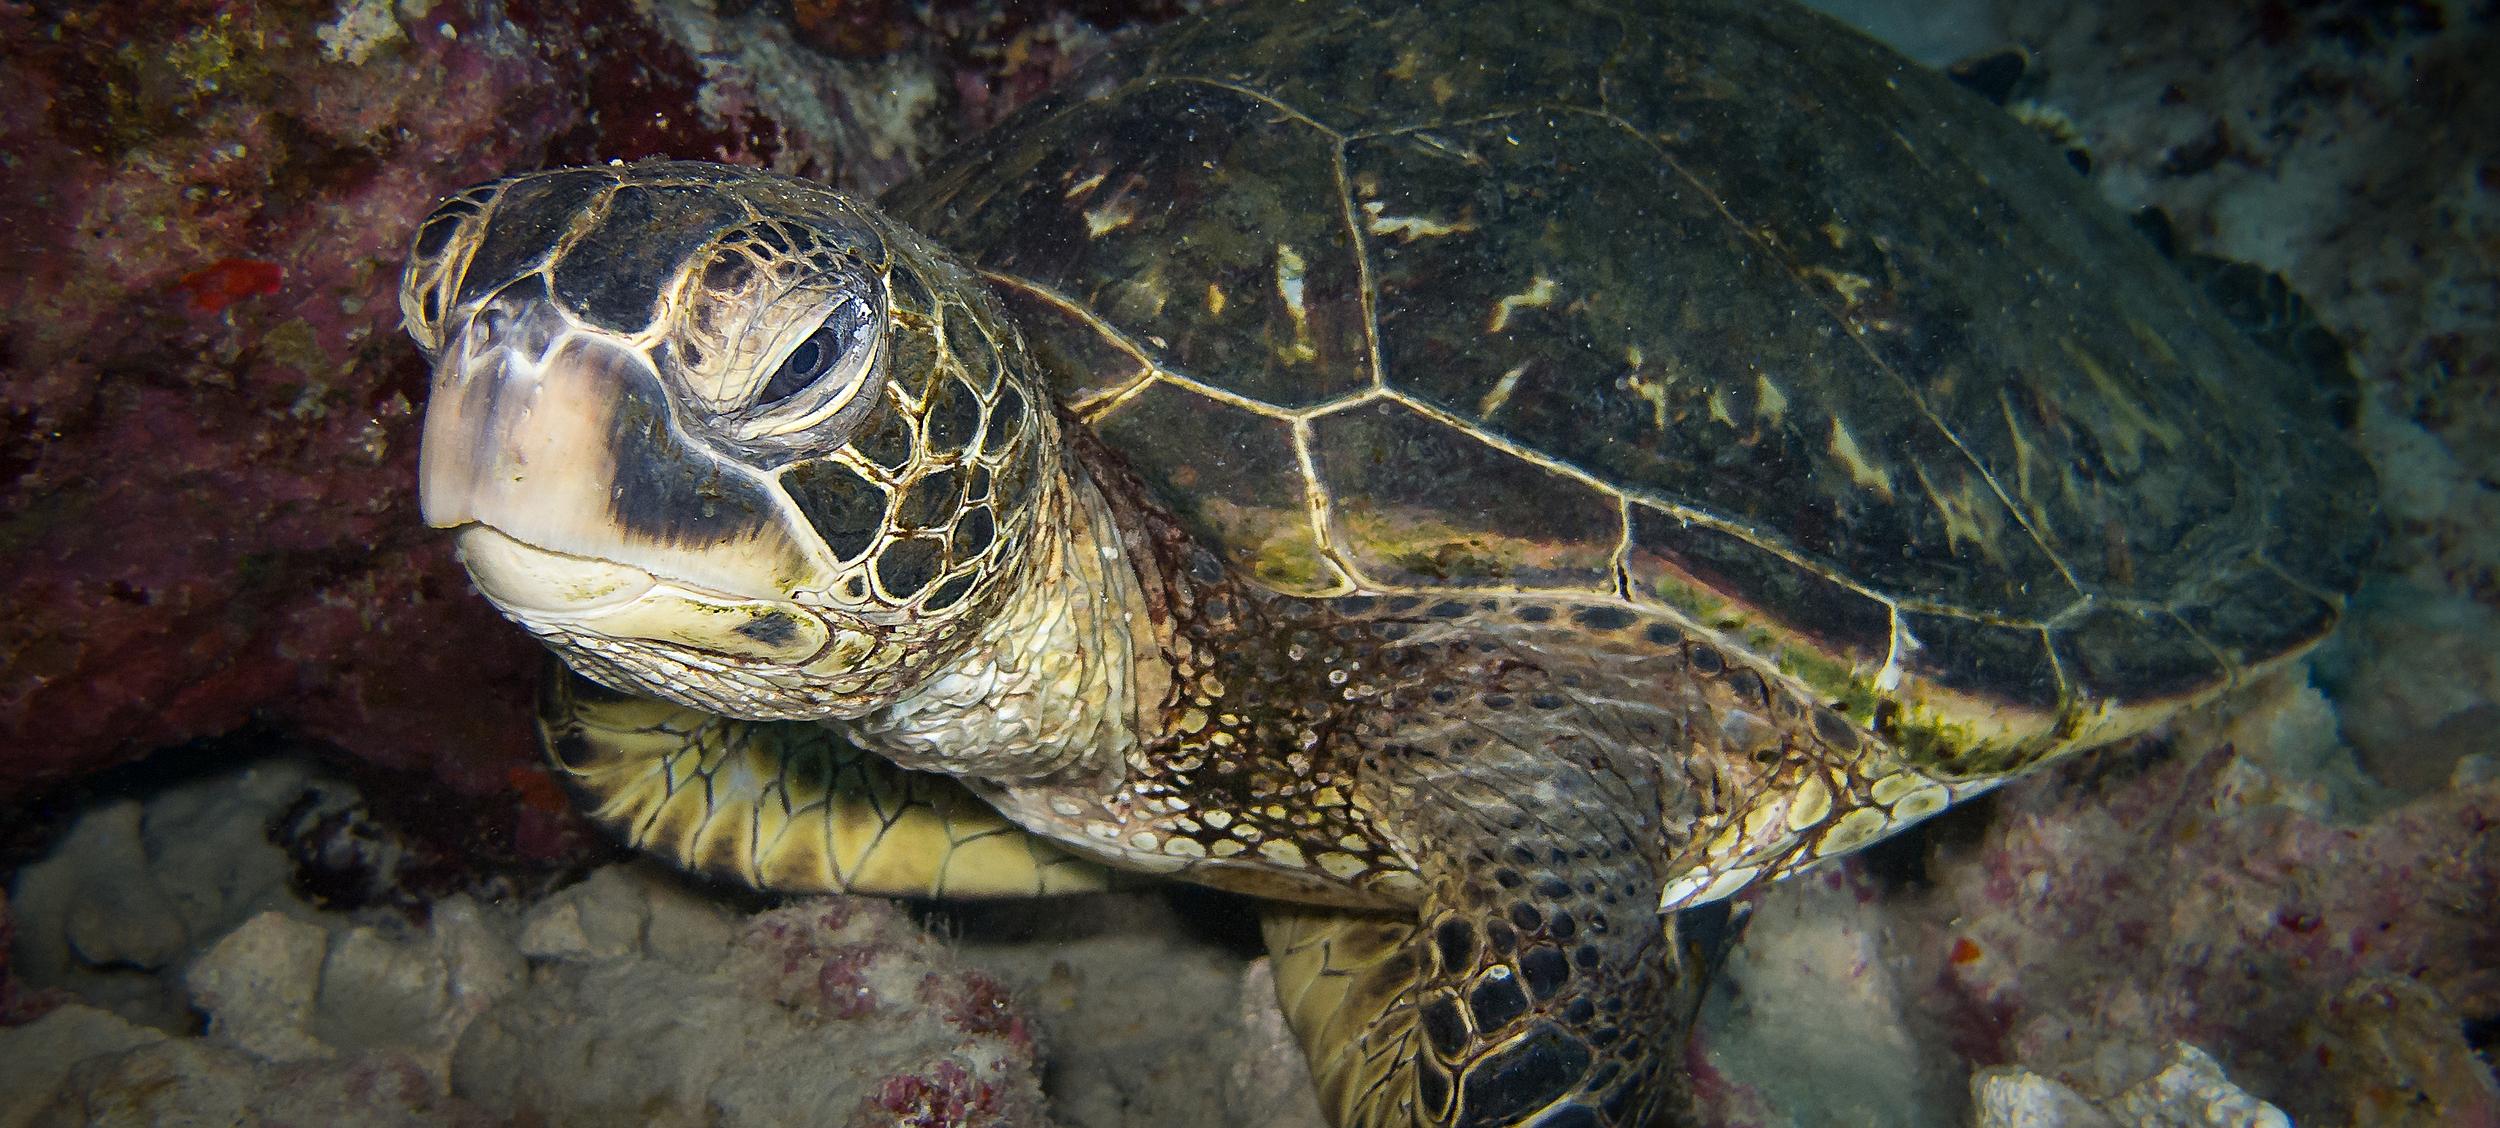 Green Sea Turtle_20140426(Crop).jpg